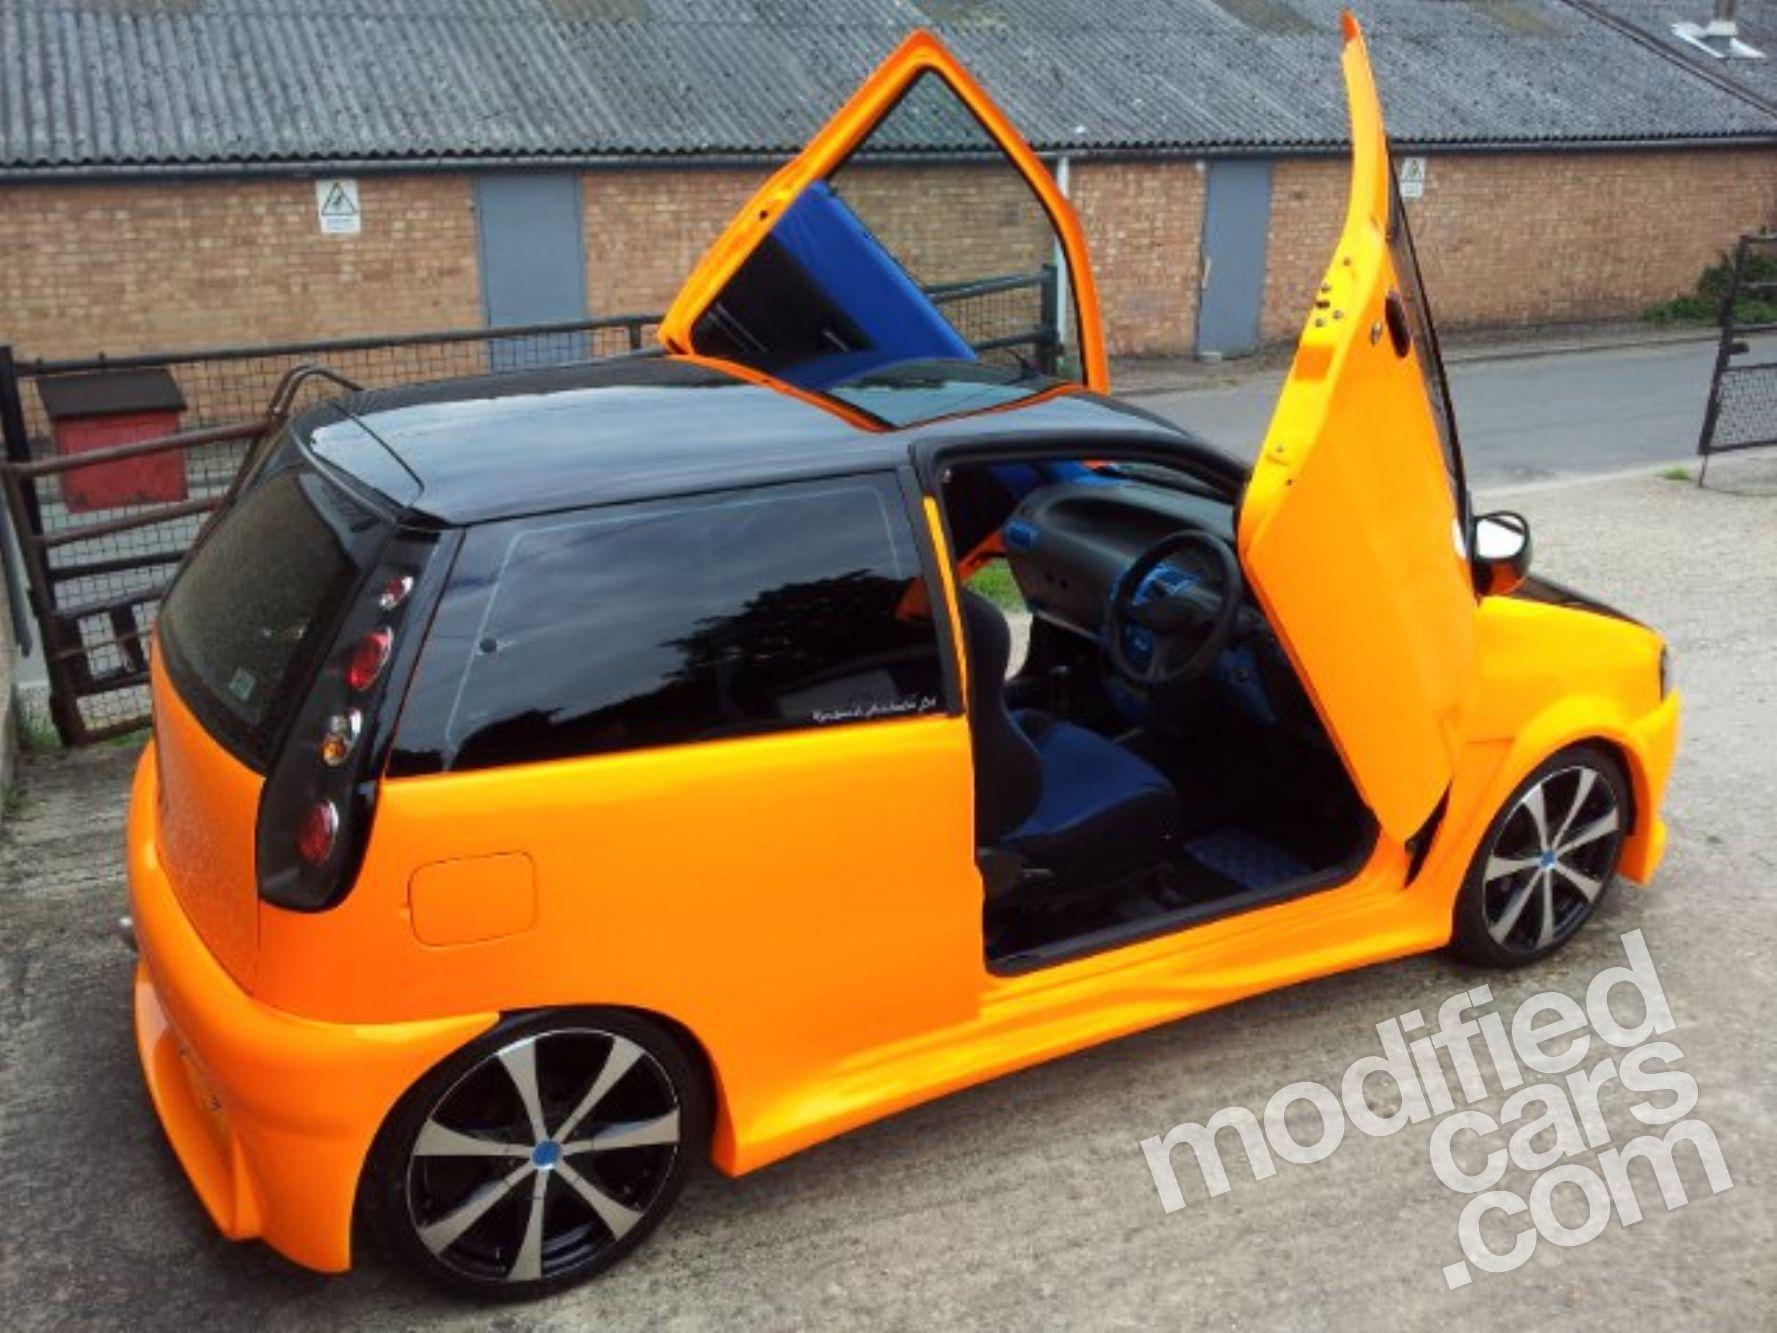 fiat punto tuning fiat punto cars vehicles. Black Bedroom Furniture Sets. Home Design Ideas